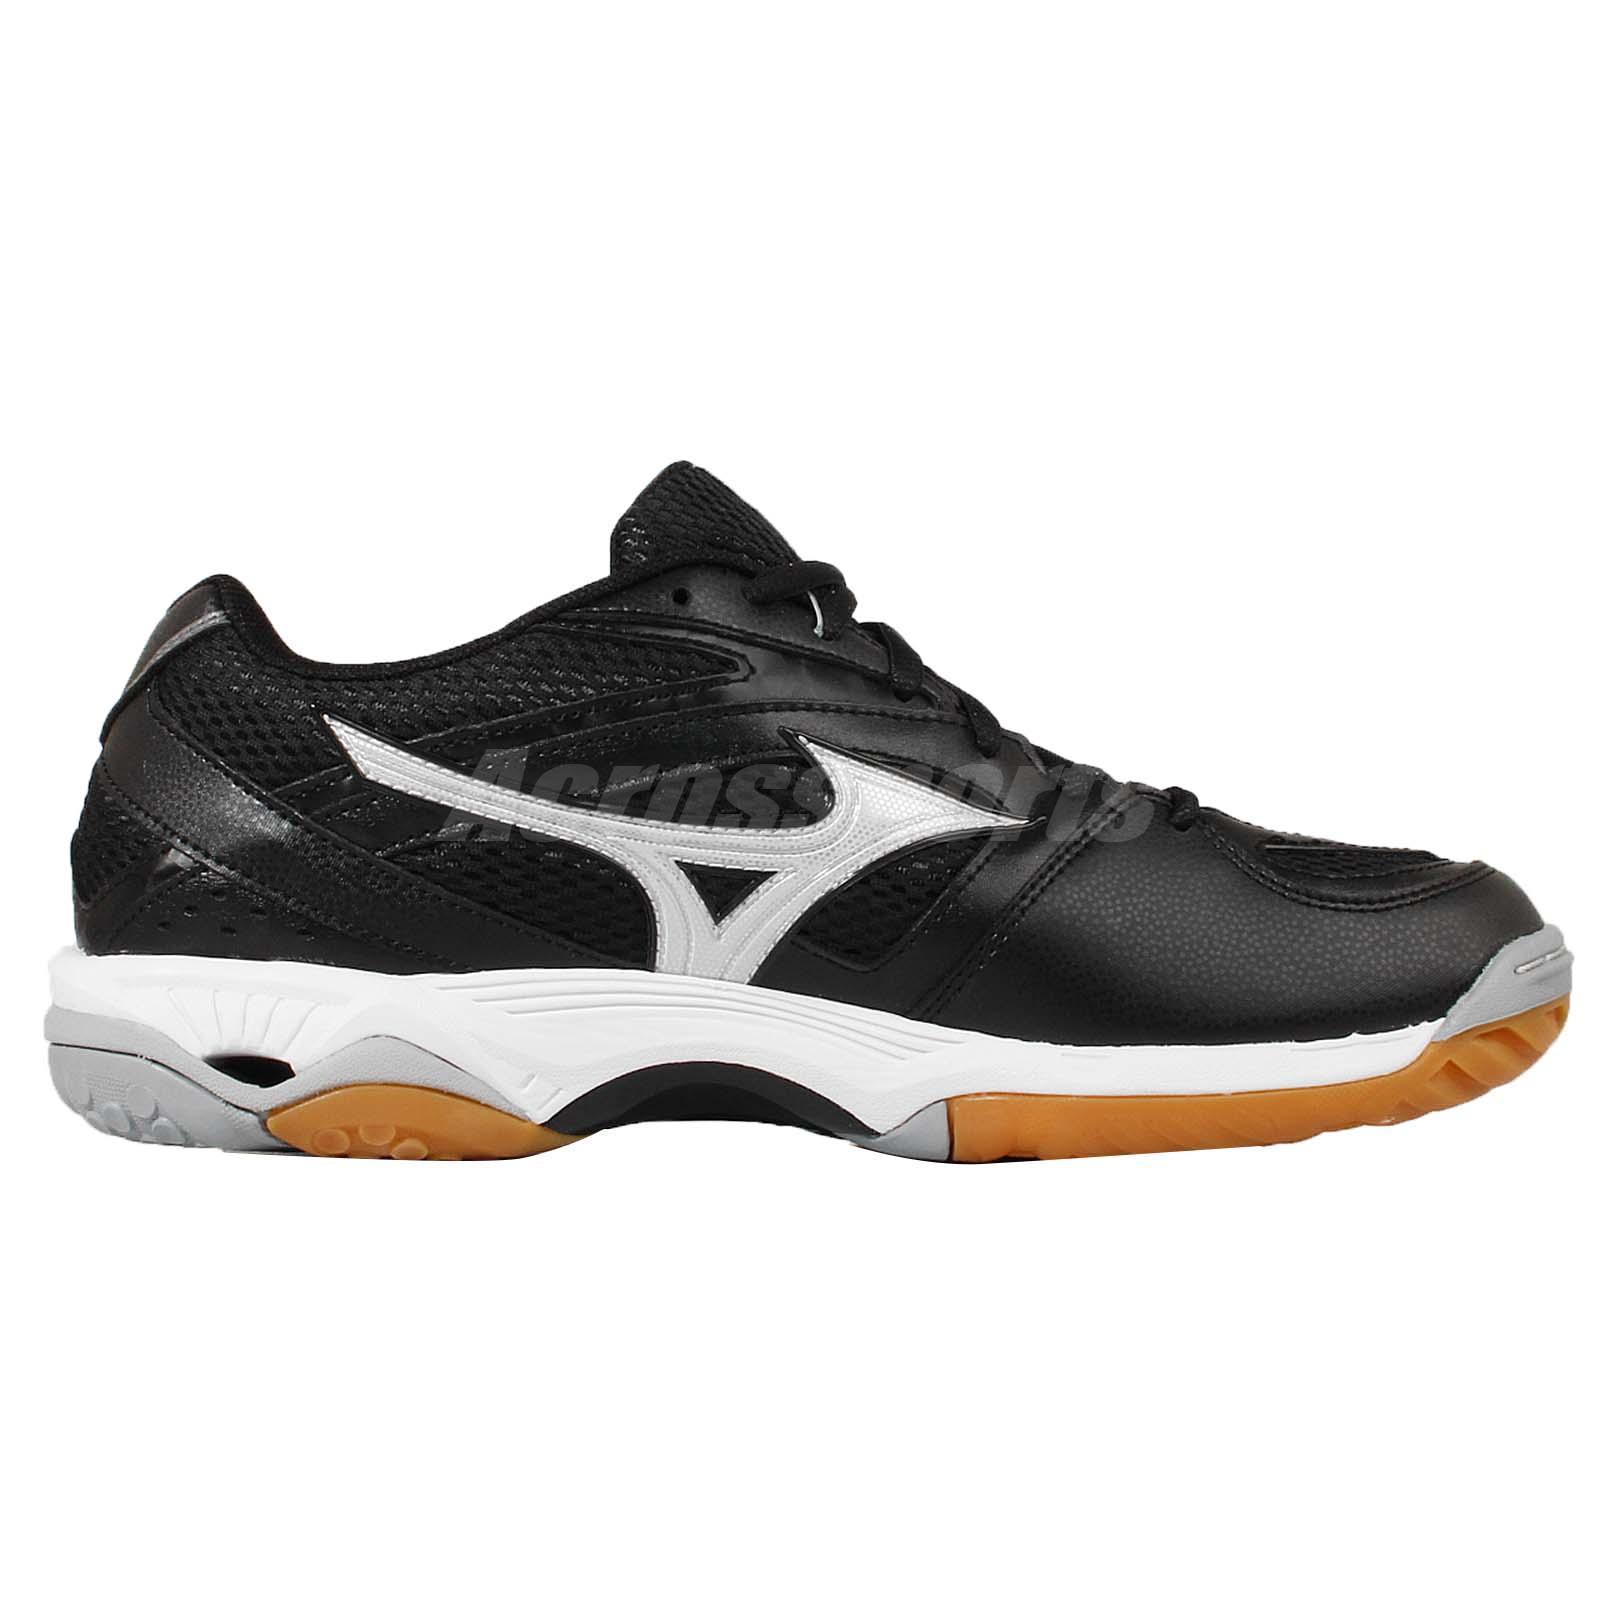 Mizuno Hurricane  Volleyball Shoes Mens